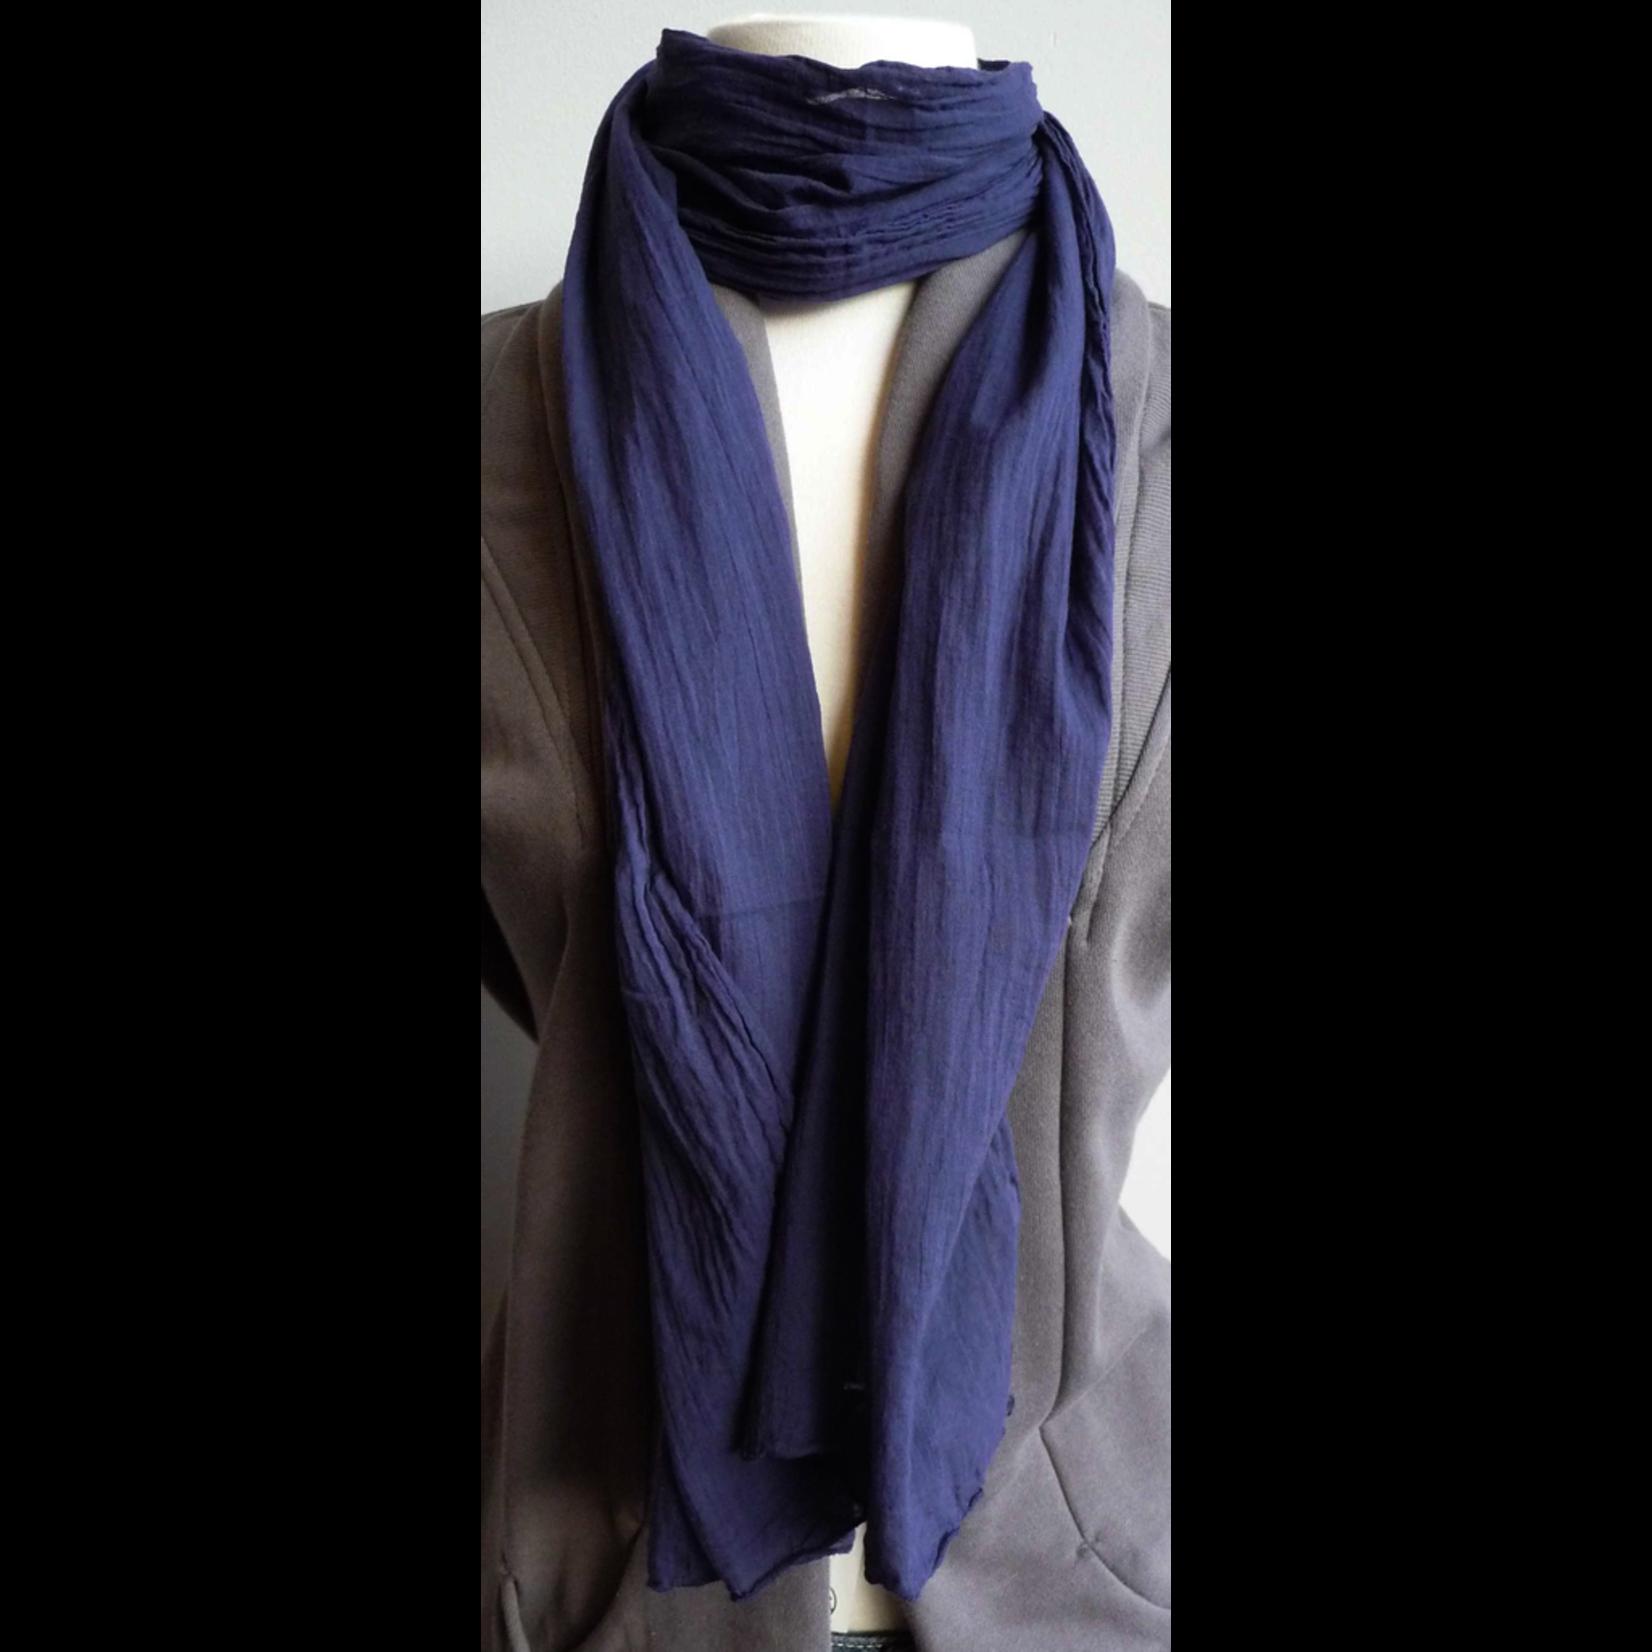 Coin 1804 Coin 1804 voile scarf